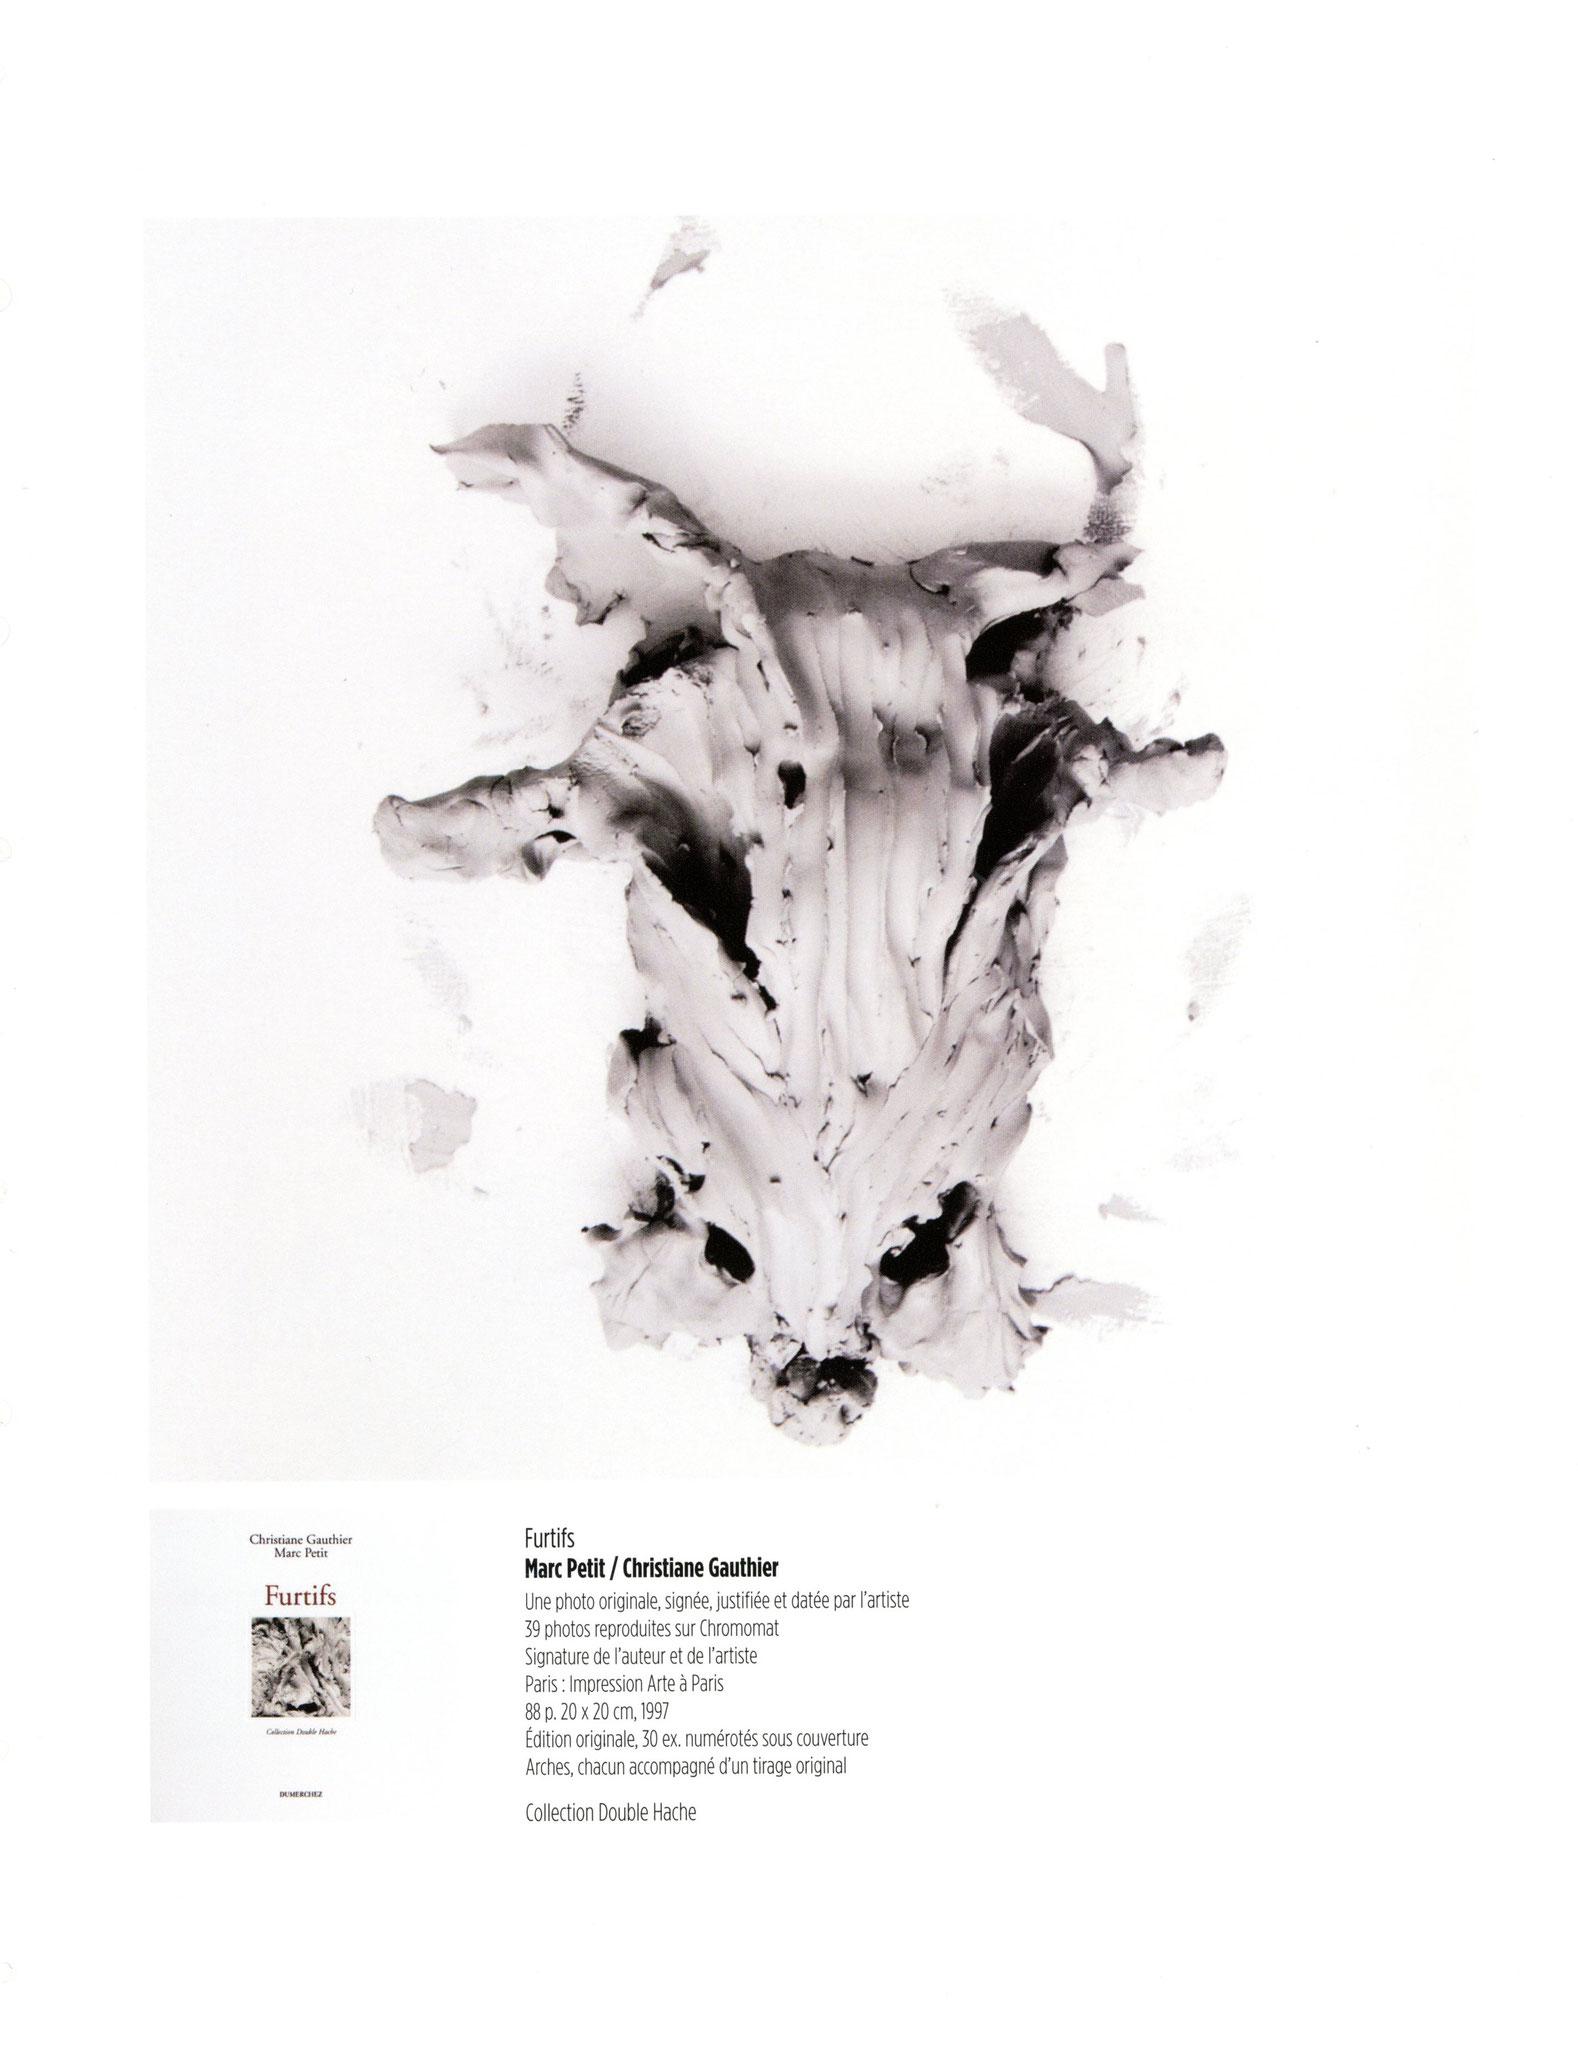 Furtifs - Marc Petit / Christiane Gauthier